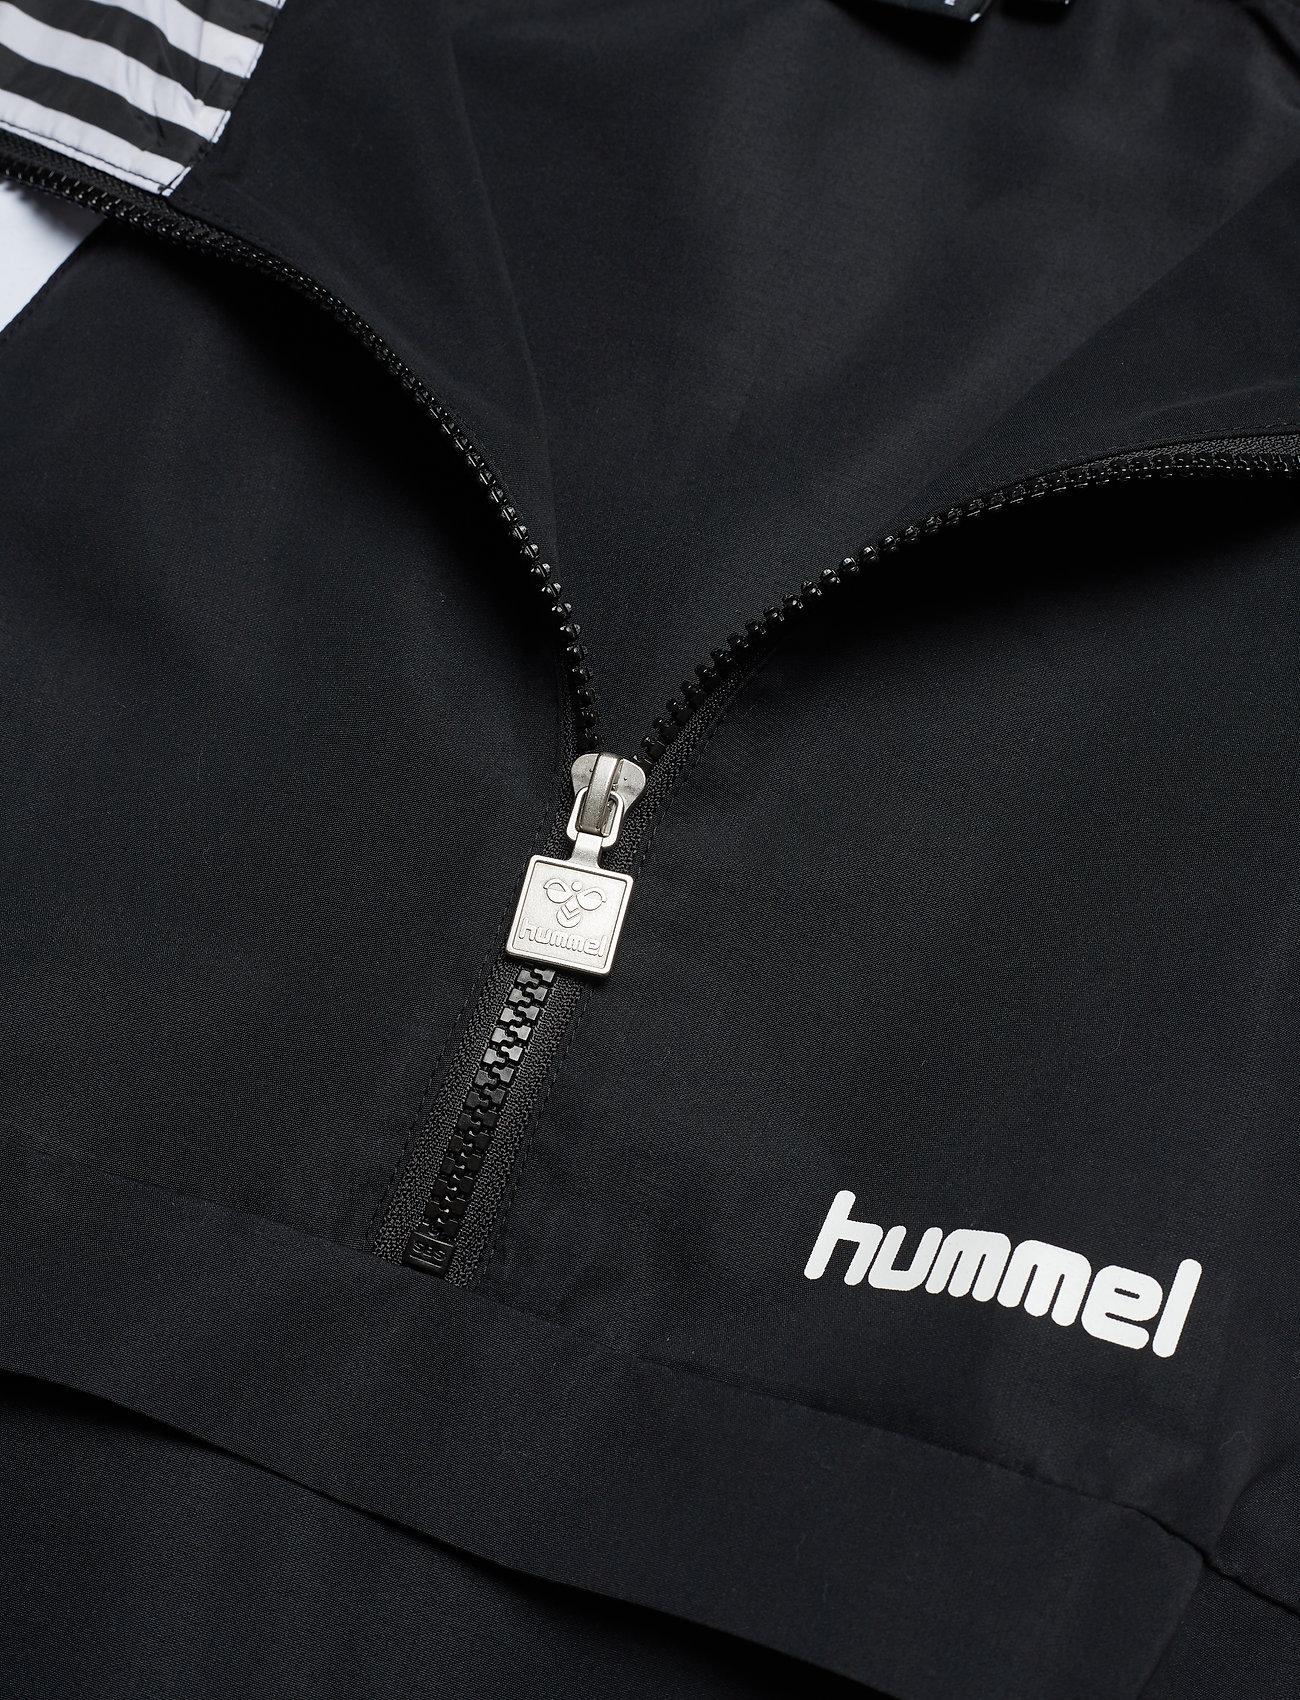 Hmlchili Half Zip (Black) (1000 kr) - Hummel Hive